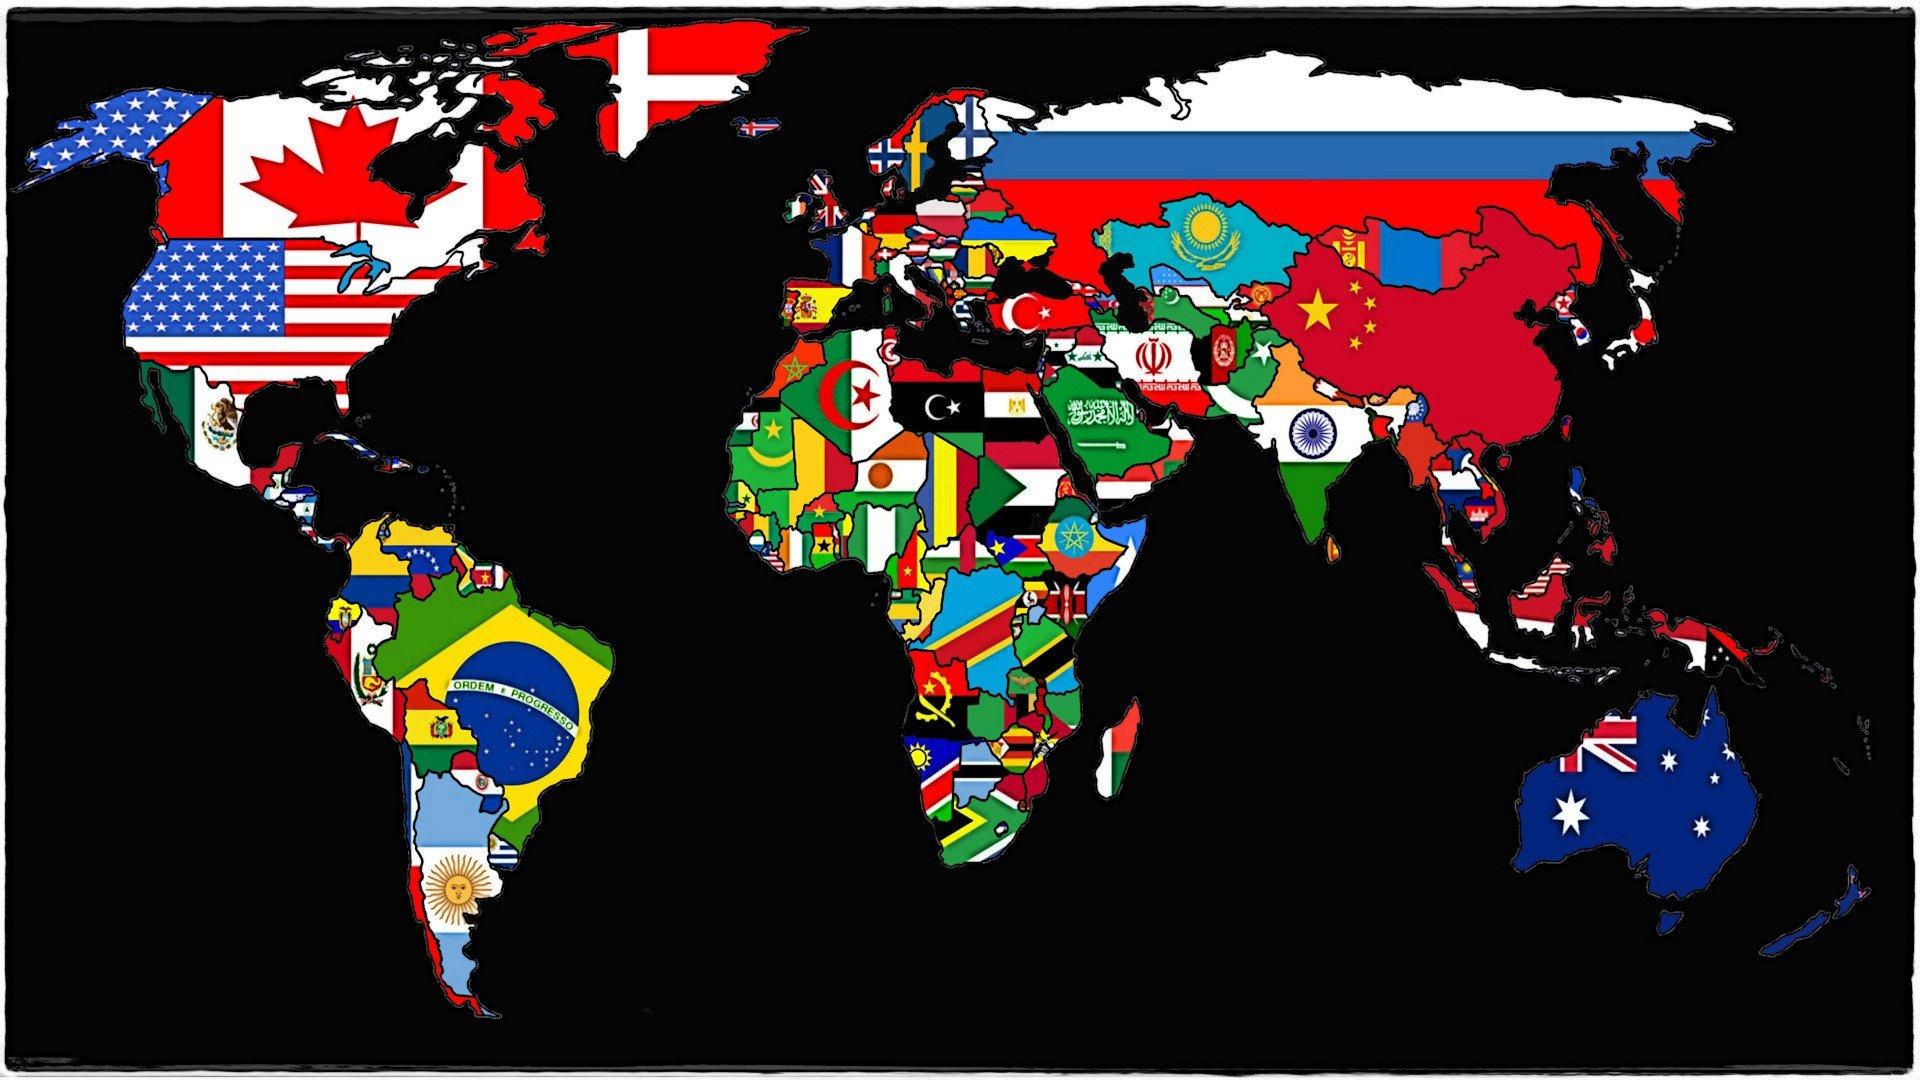 Papel De Parede 1920x1080 Px Playerunknowns: Papel De Parede : 1920x1080 Px, Bandeira, Mapa, Nações